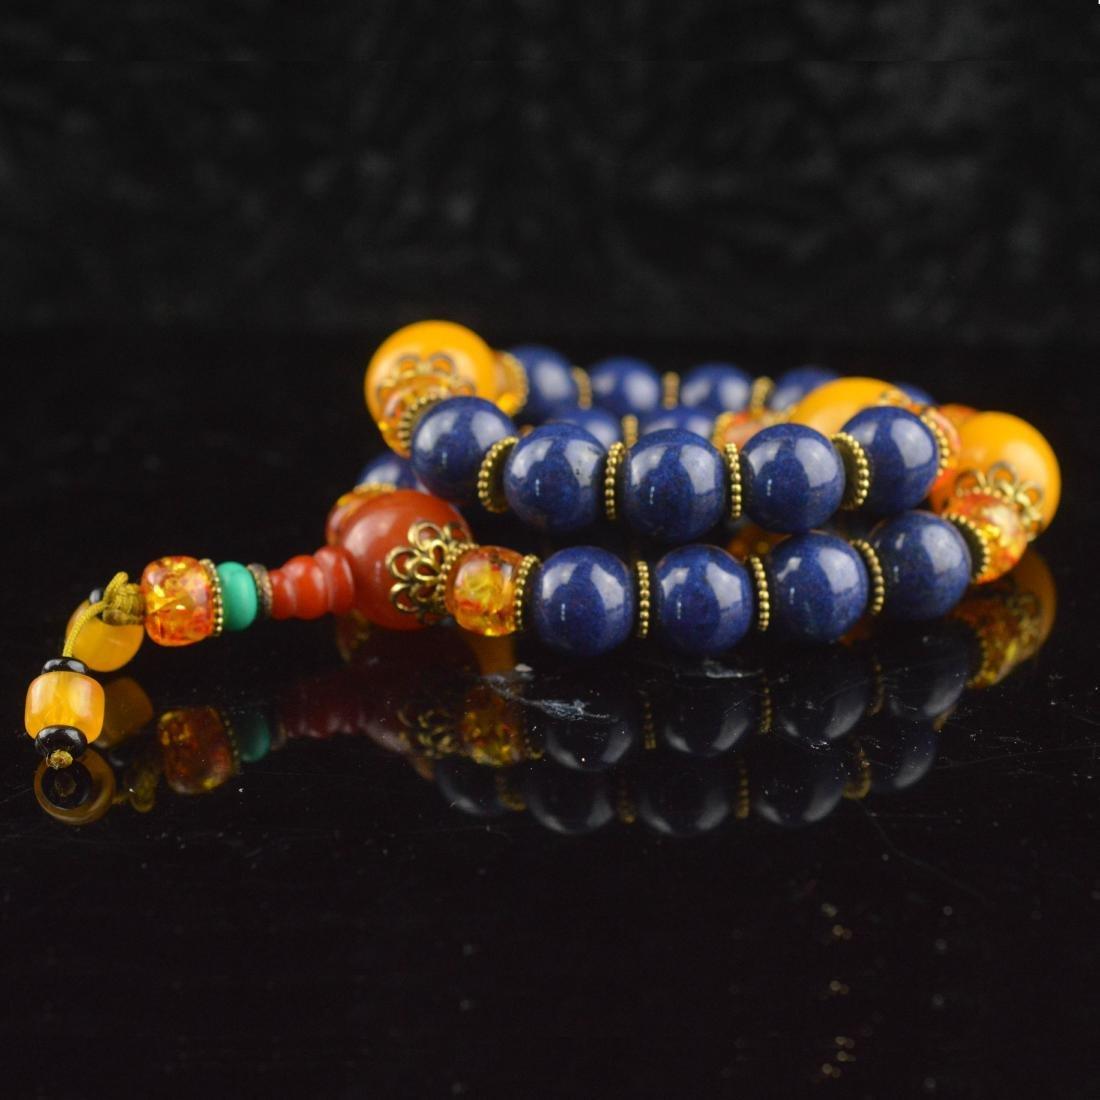 Lapis Lazuli & Amber Bead Wrist Bracelet - 2